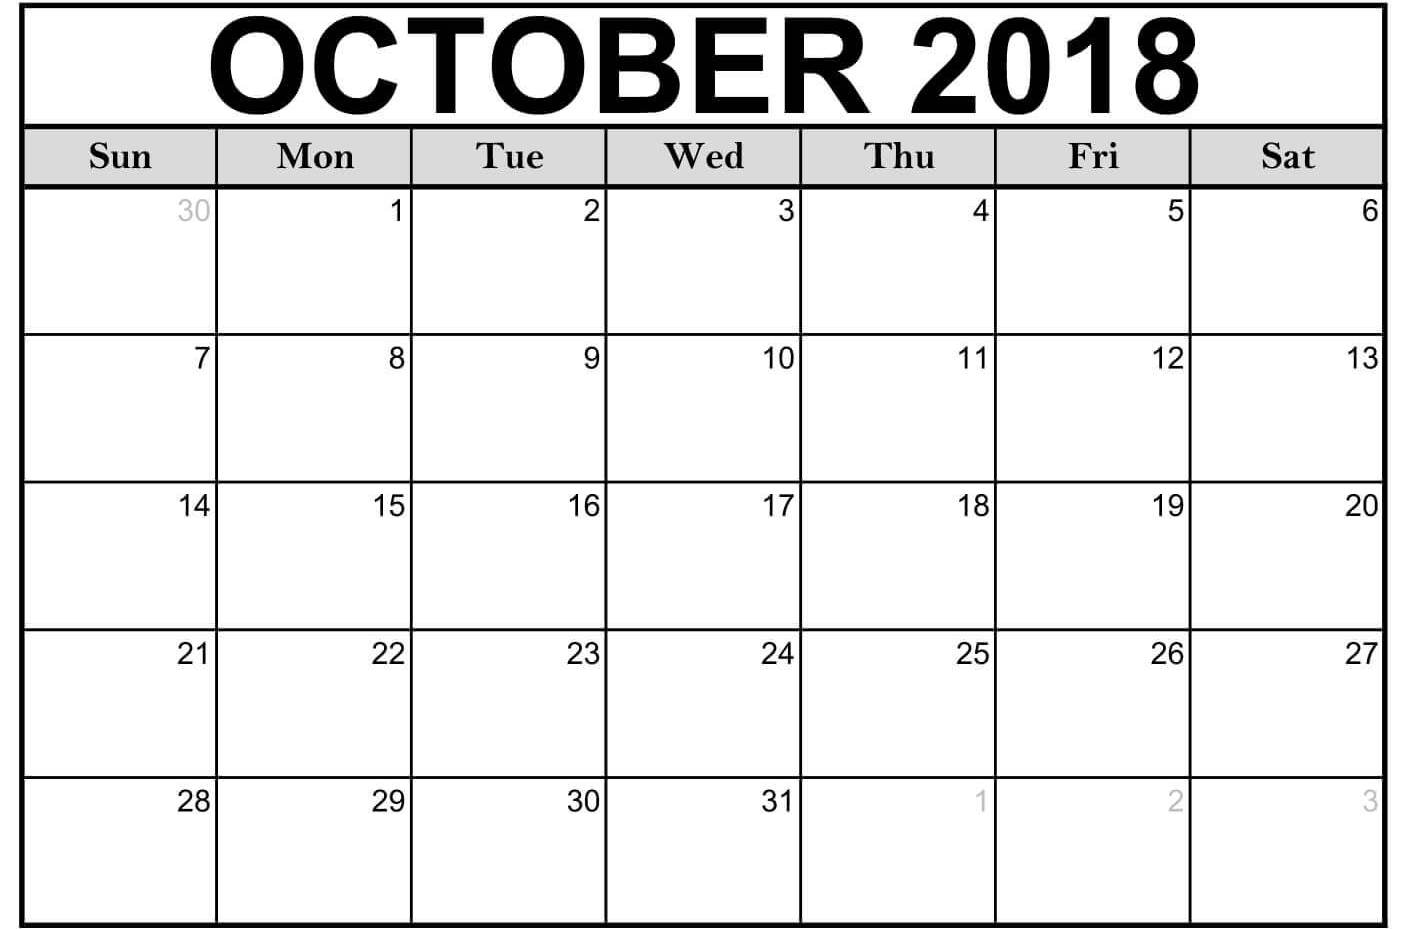 Blank October 2018 Printable Calendar